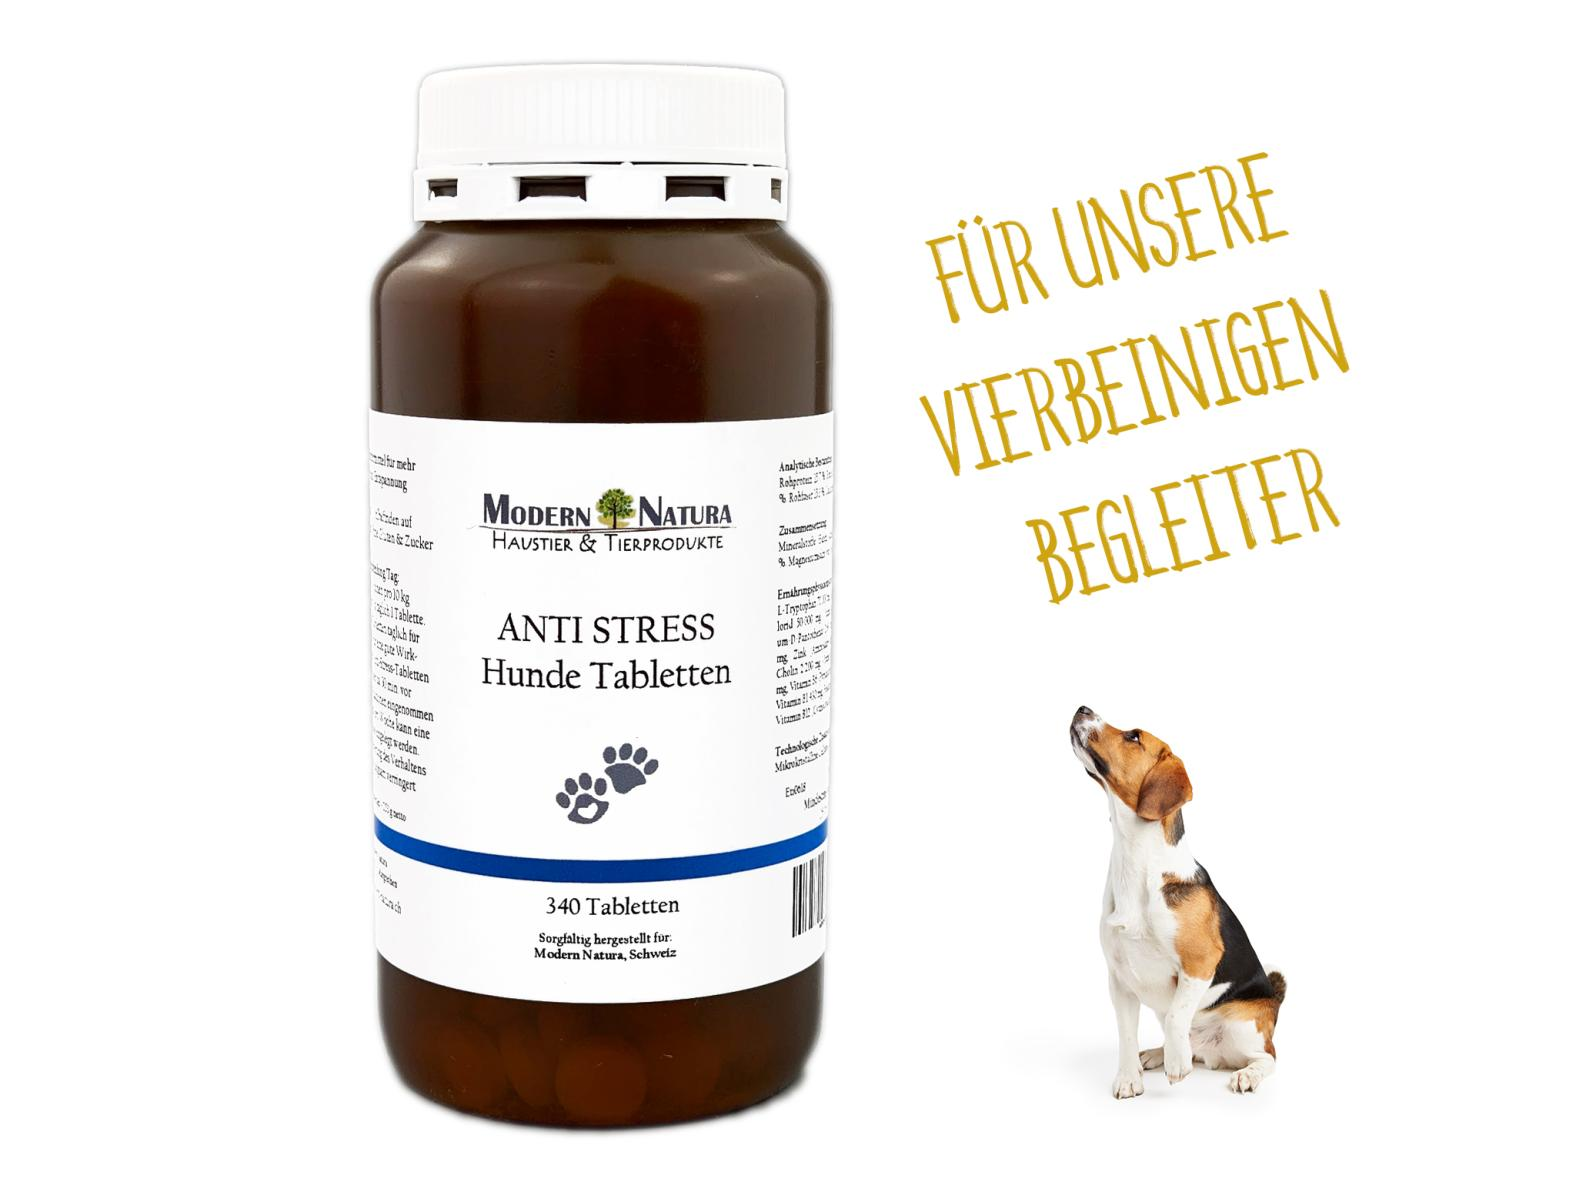 Anti Stress Hunde Tabletten (340 Stück)